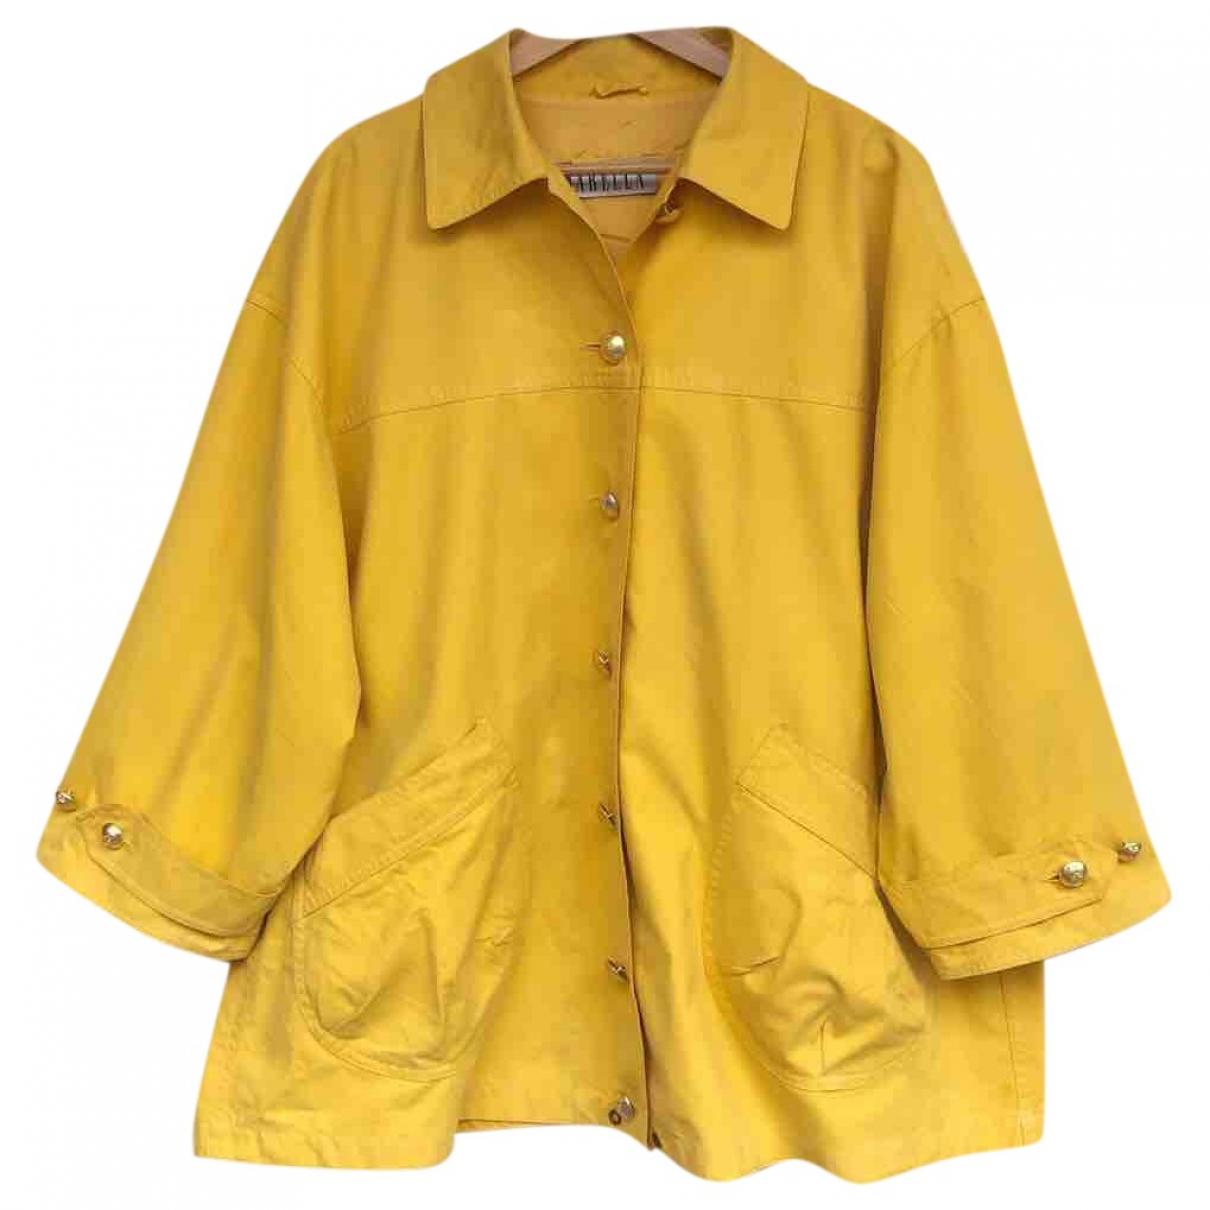 Marella \N Yellow Cotton jacket for Women 40 IT